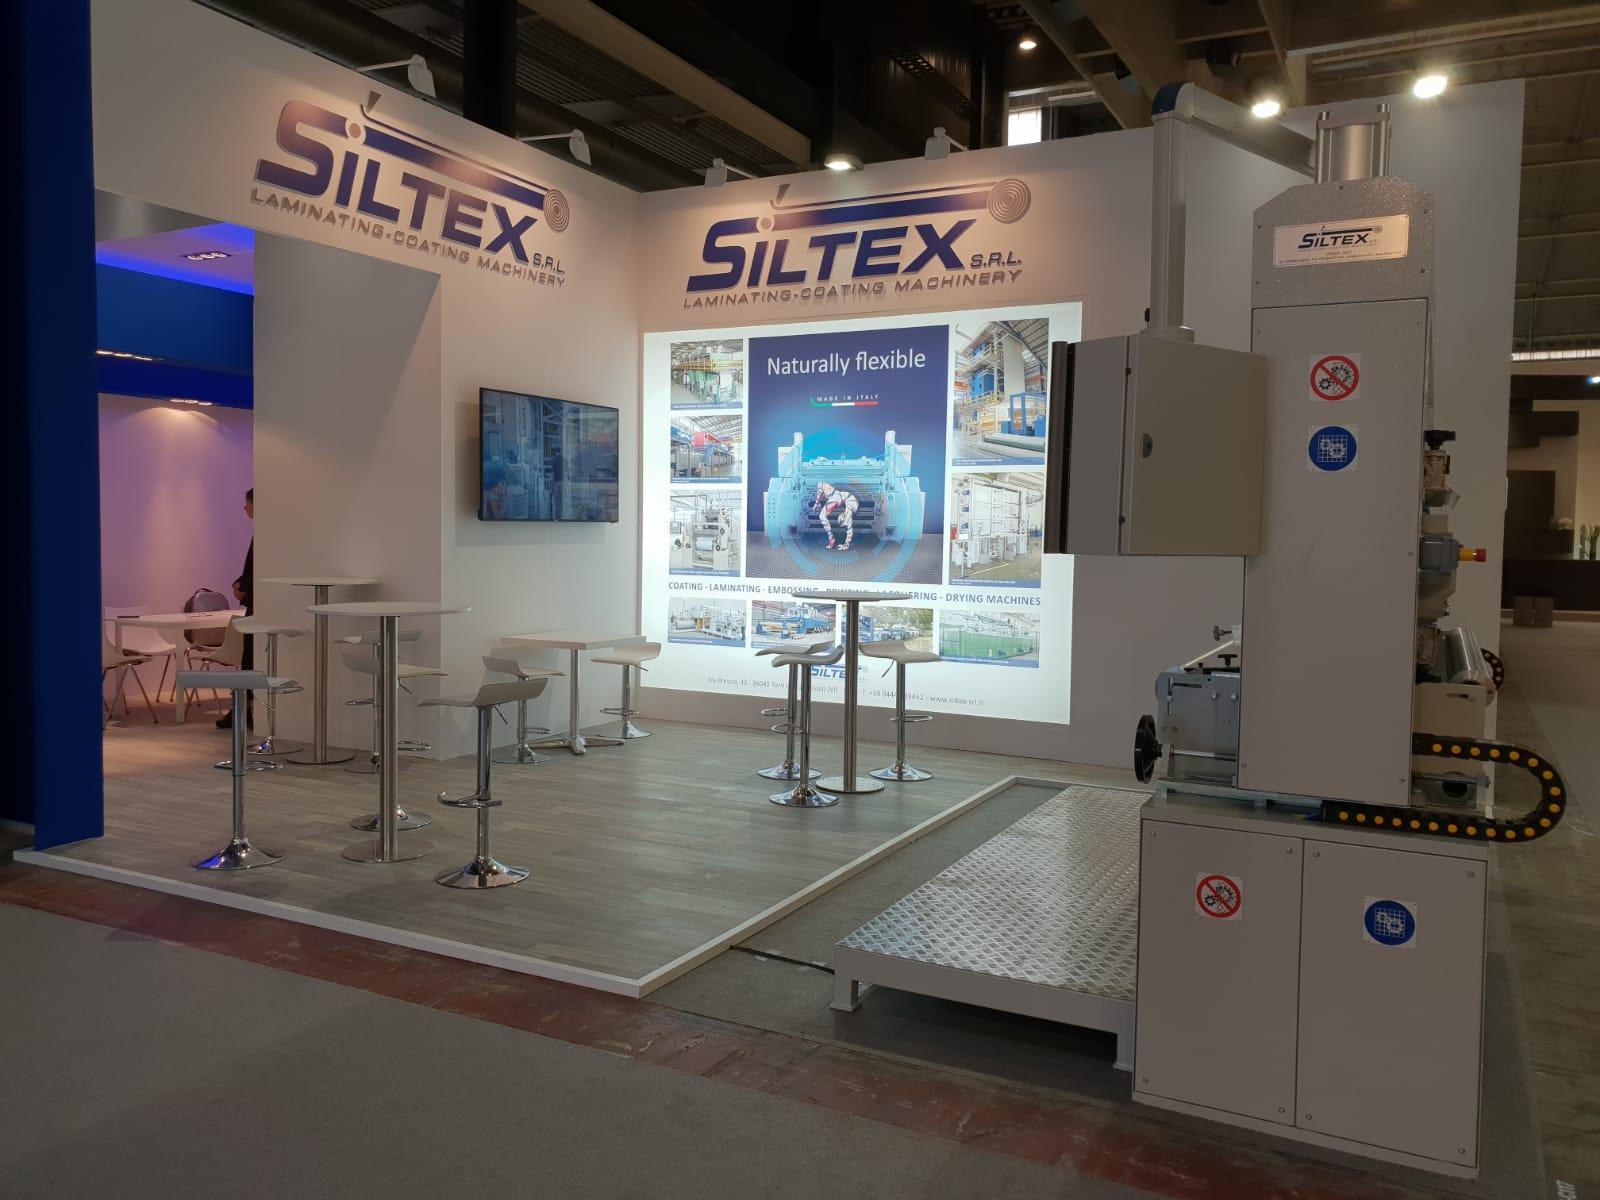 Siltex - Itma 2019